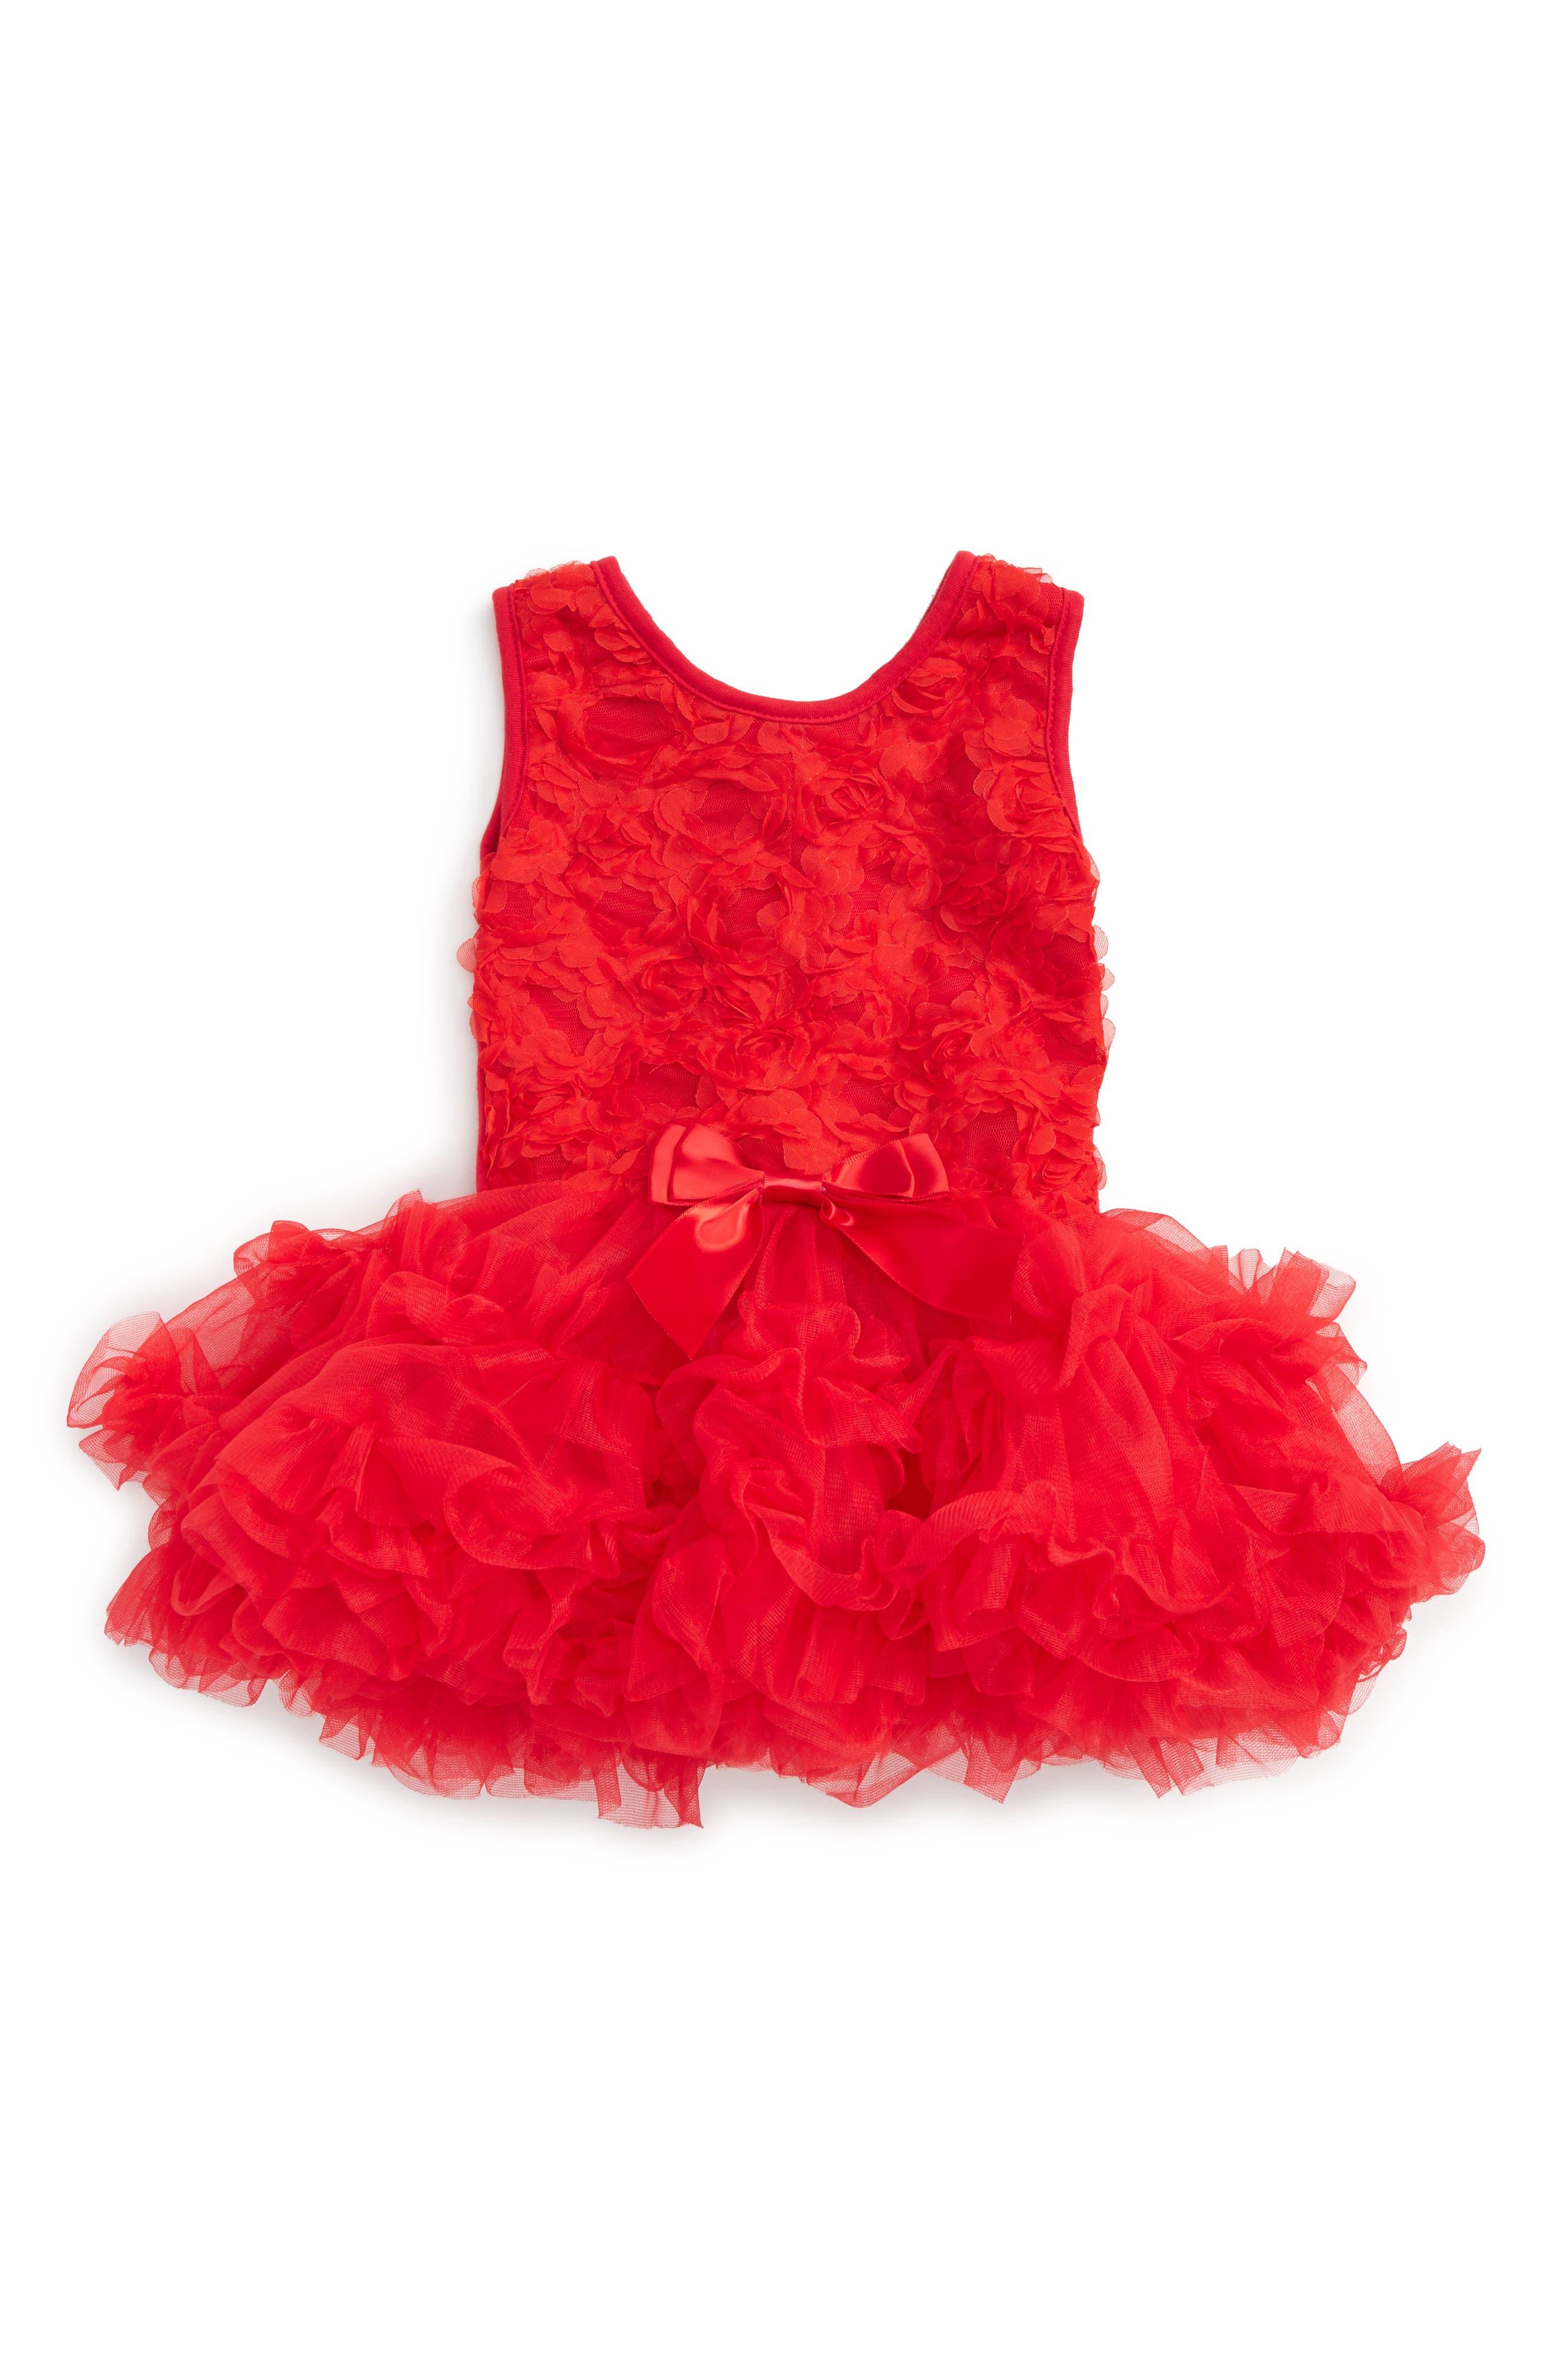 Alternate Image 1 Selected - Popatu Rosette Tutu Dress (Baby Girls)